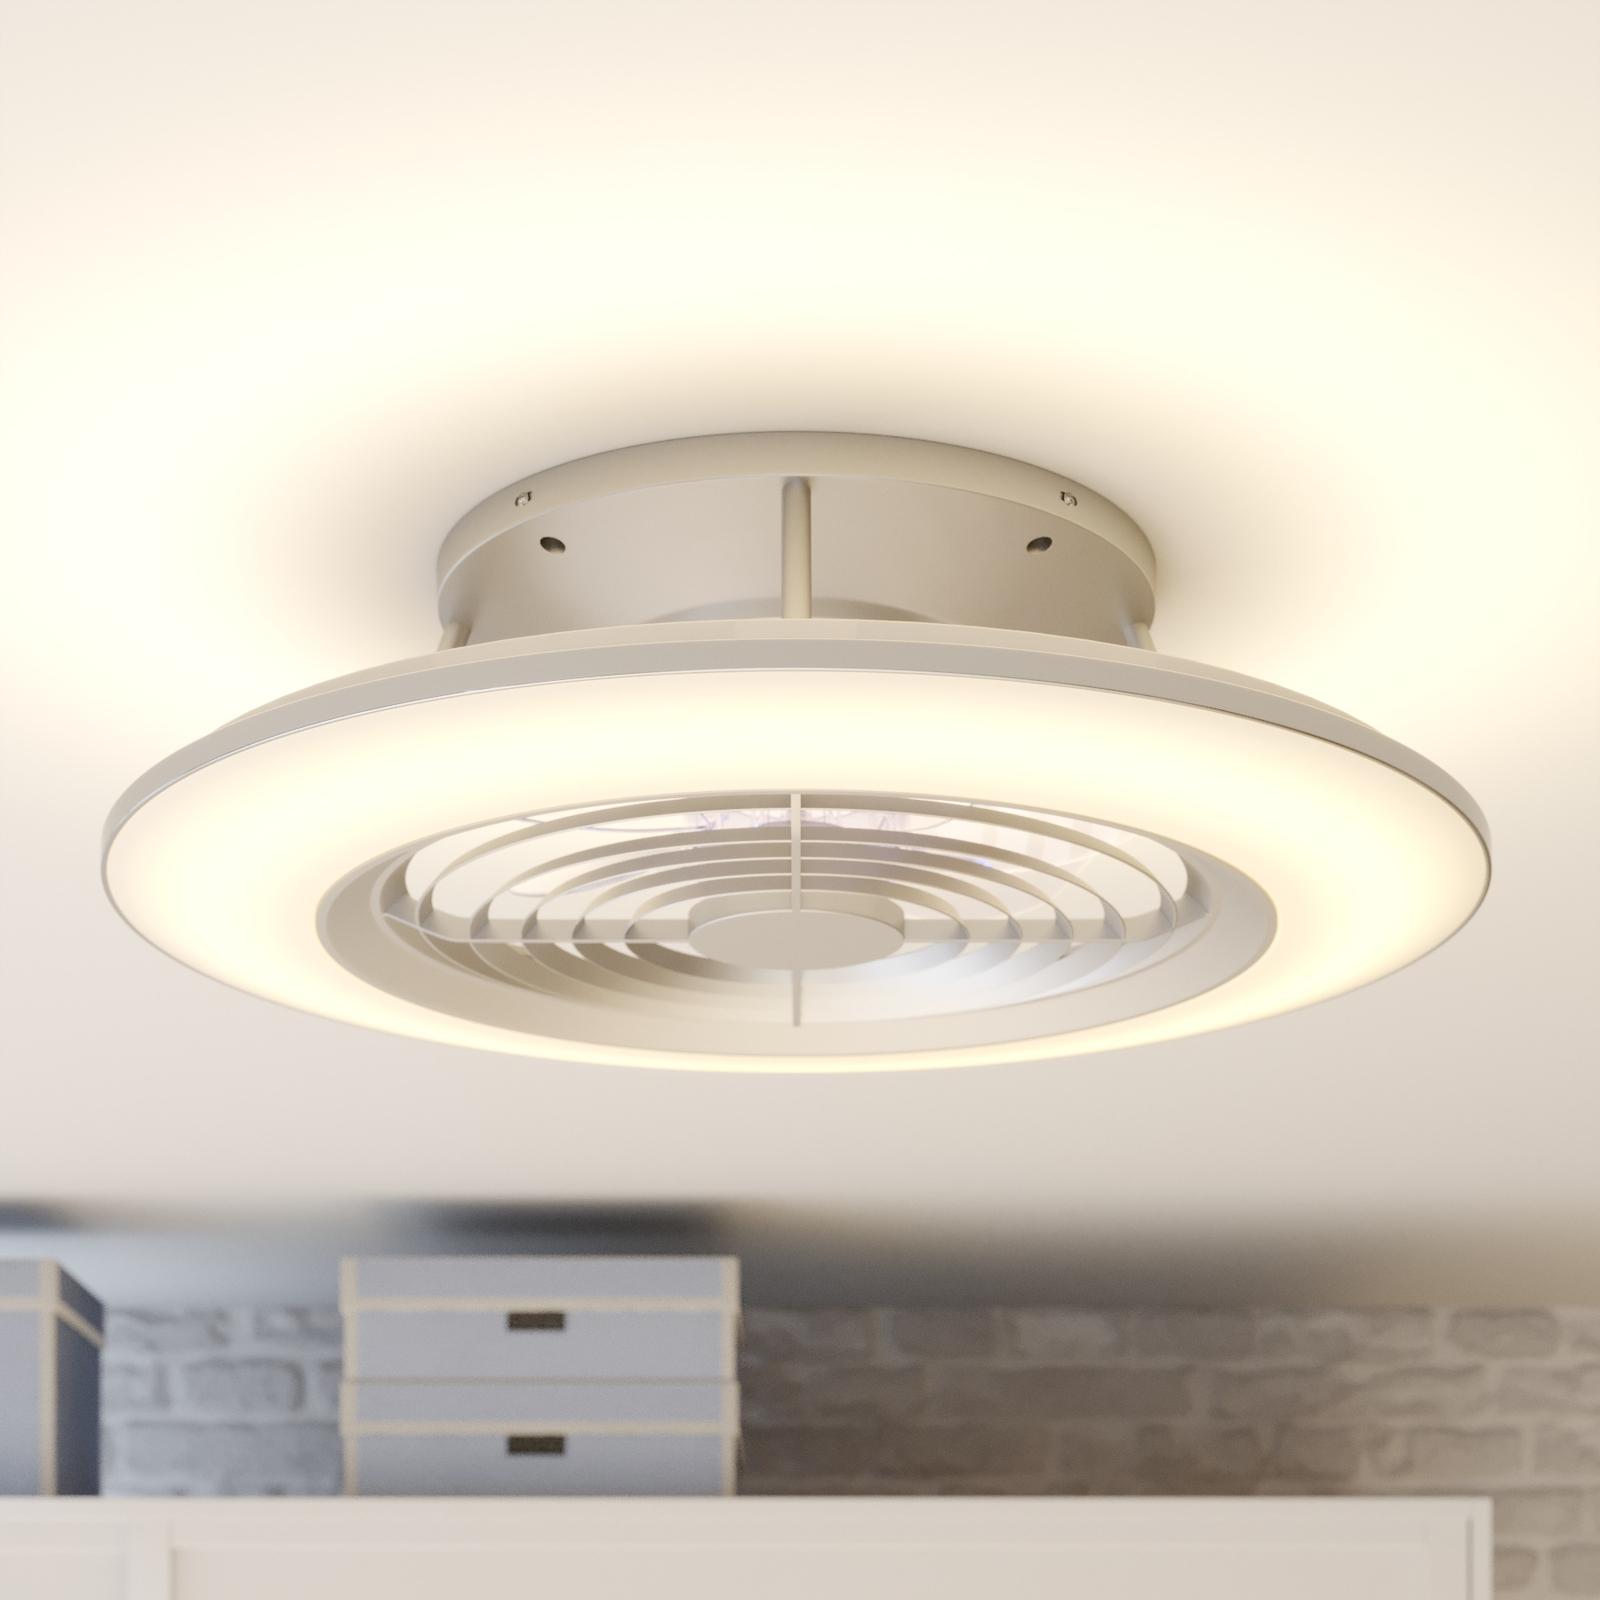 Arcchio Fenio ventilador de techo LED, plata